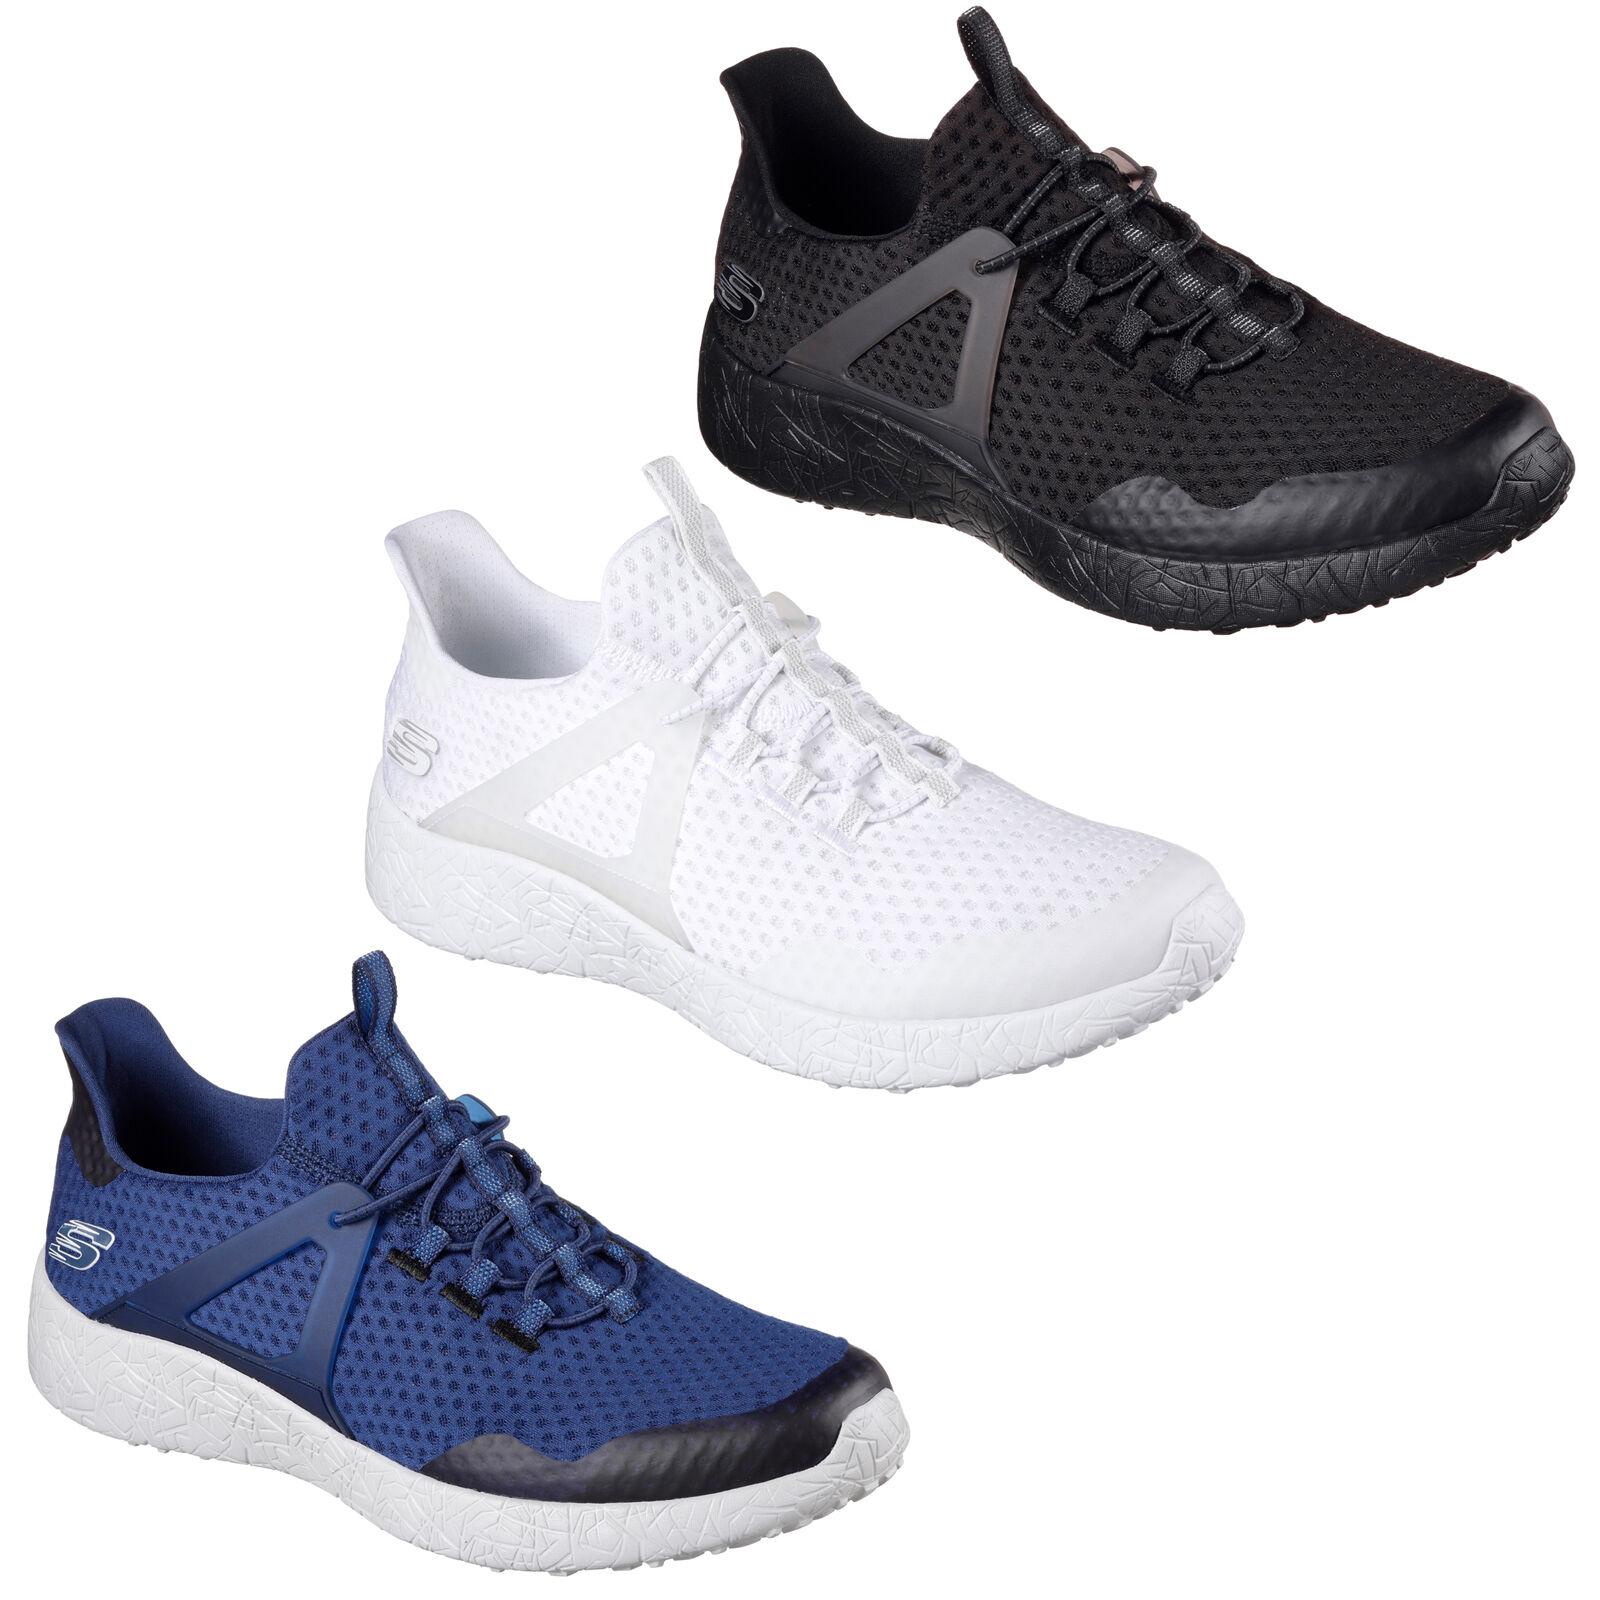 Skechers Intenso Shinz Schuhe Sportive Alla Moda, Memory da Uomo Sport Memory Moda, Foam Mesh efaf42